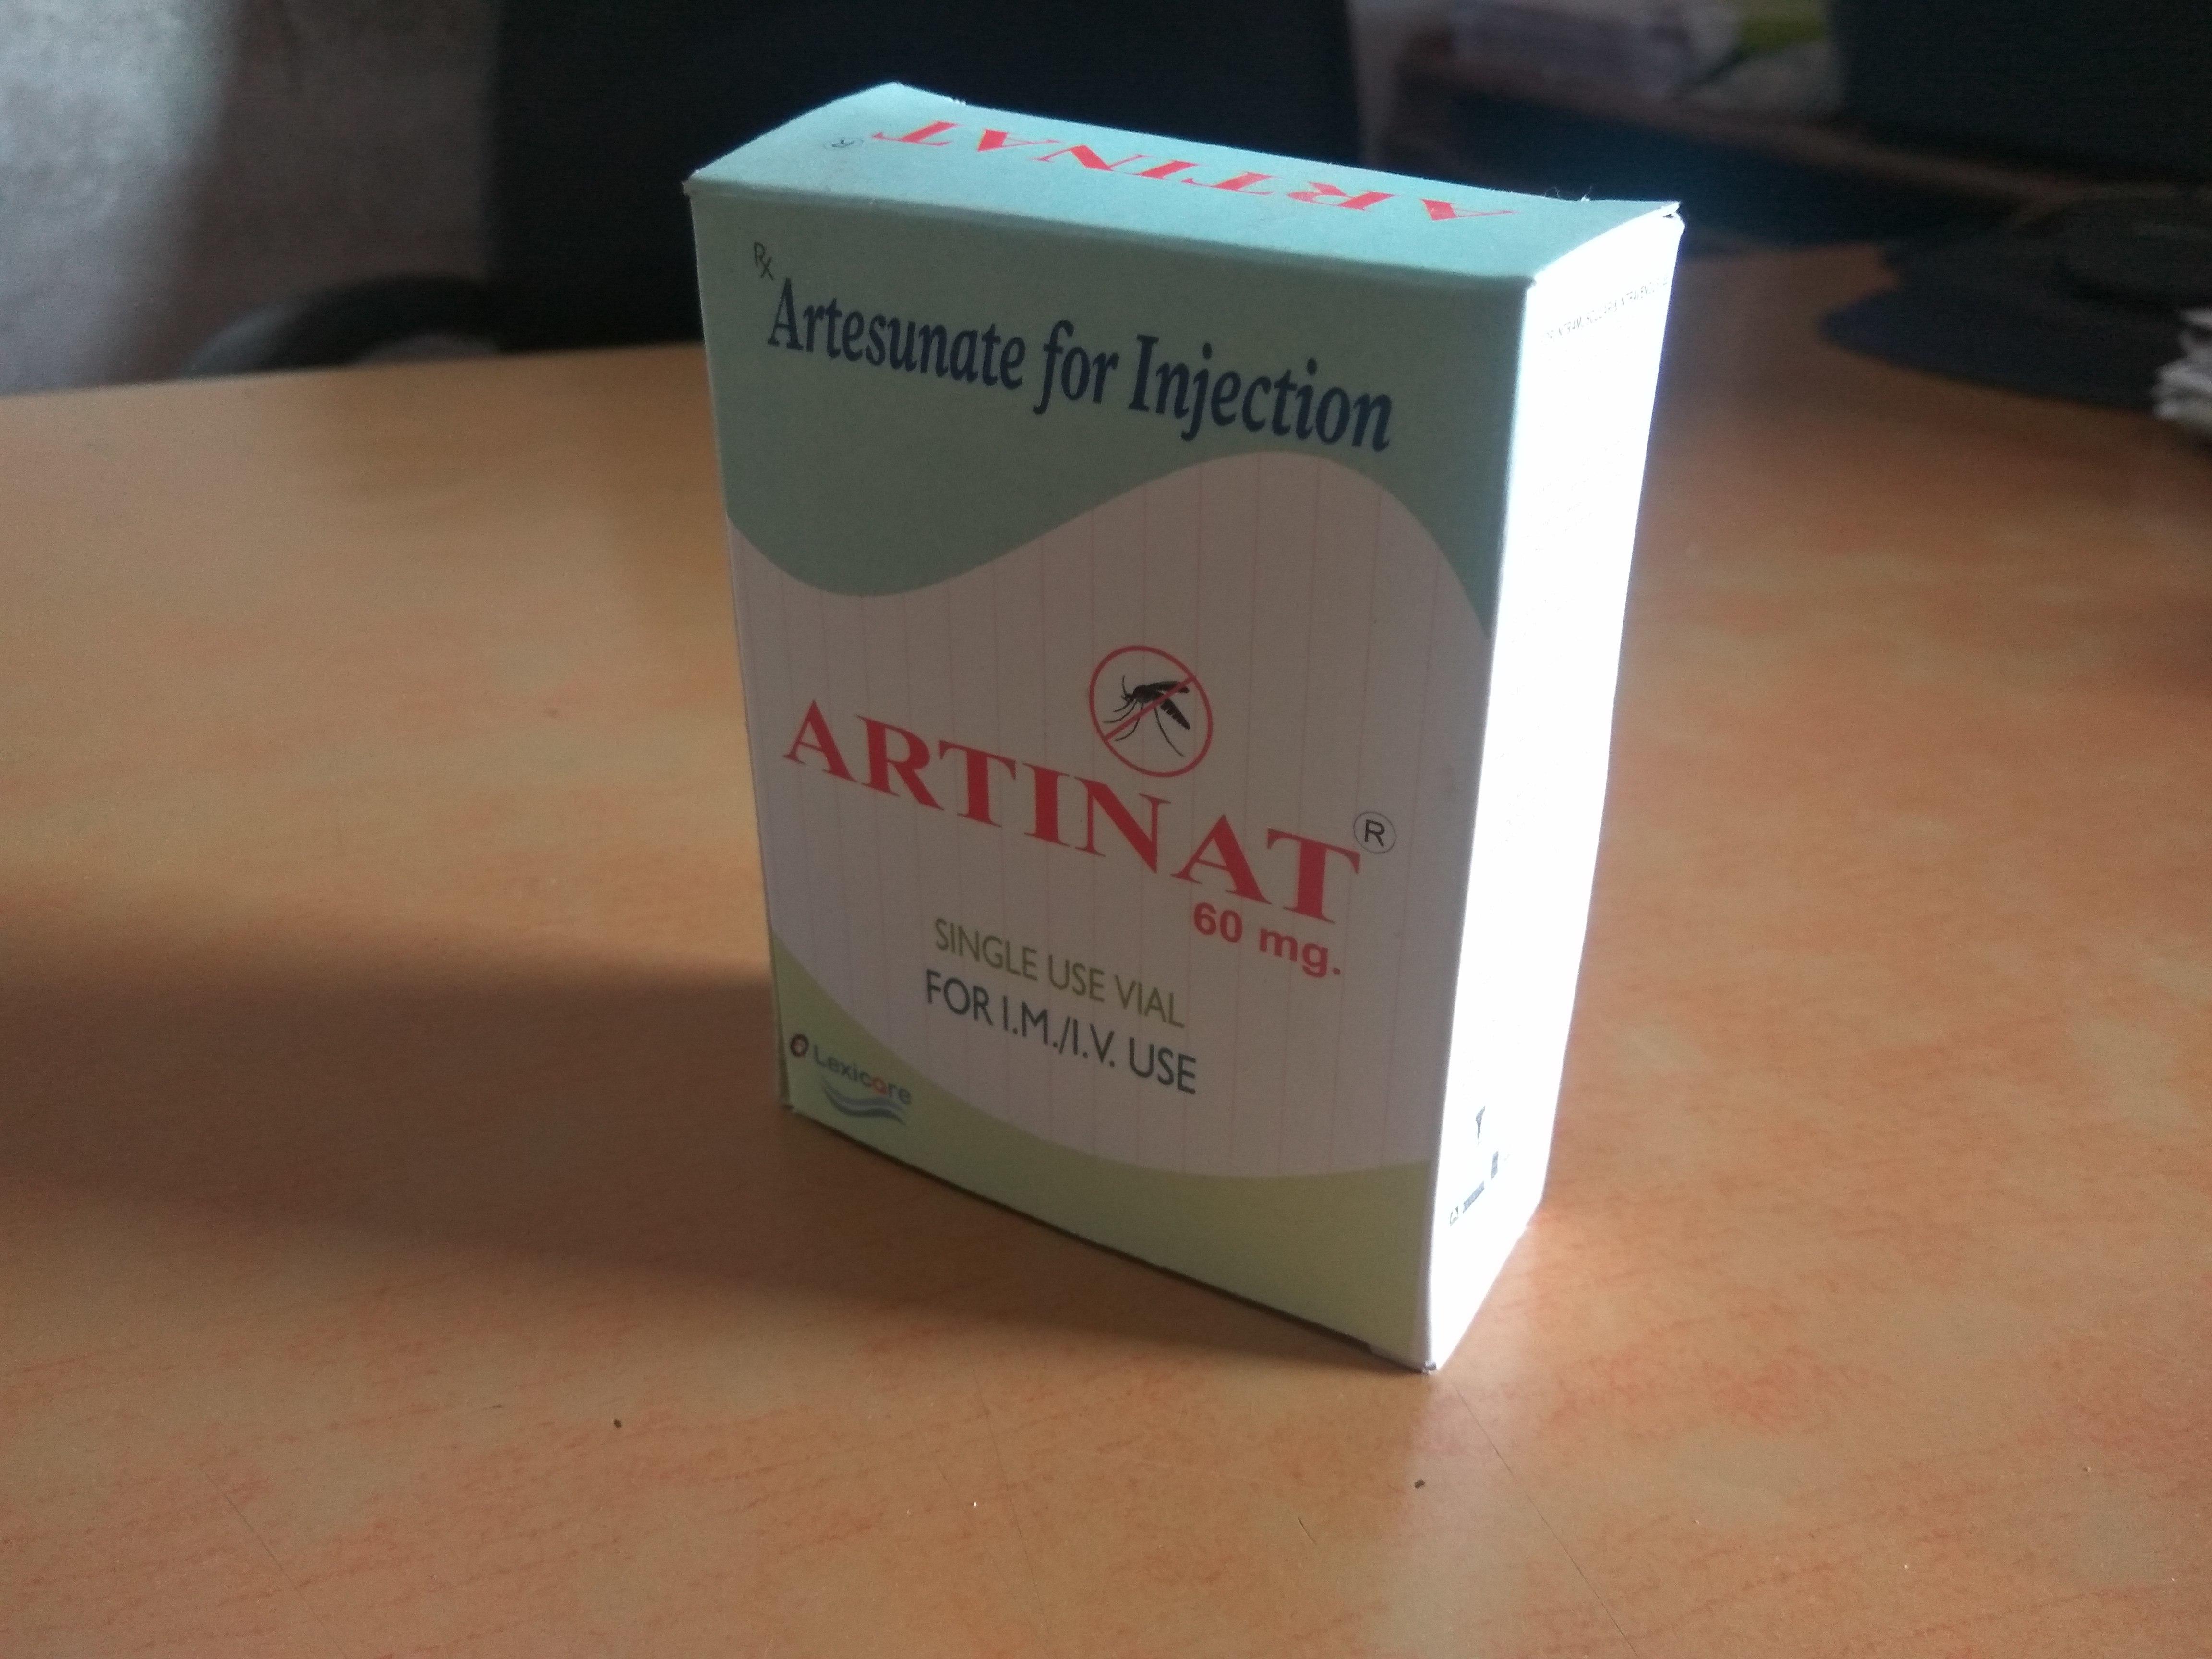 Artesunat Injection